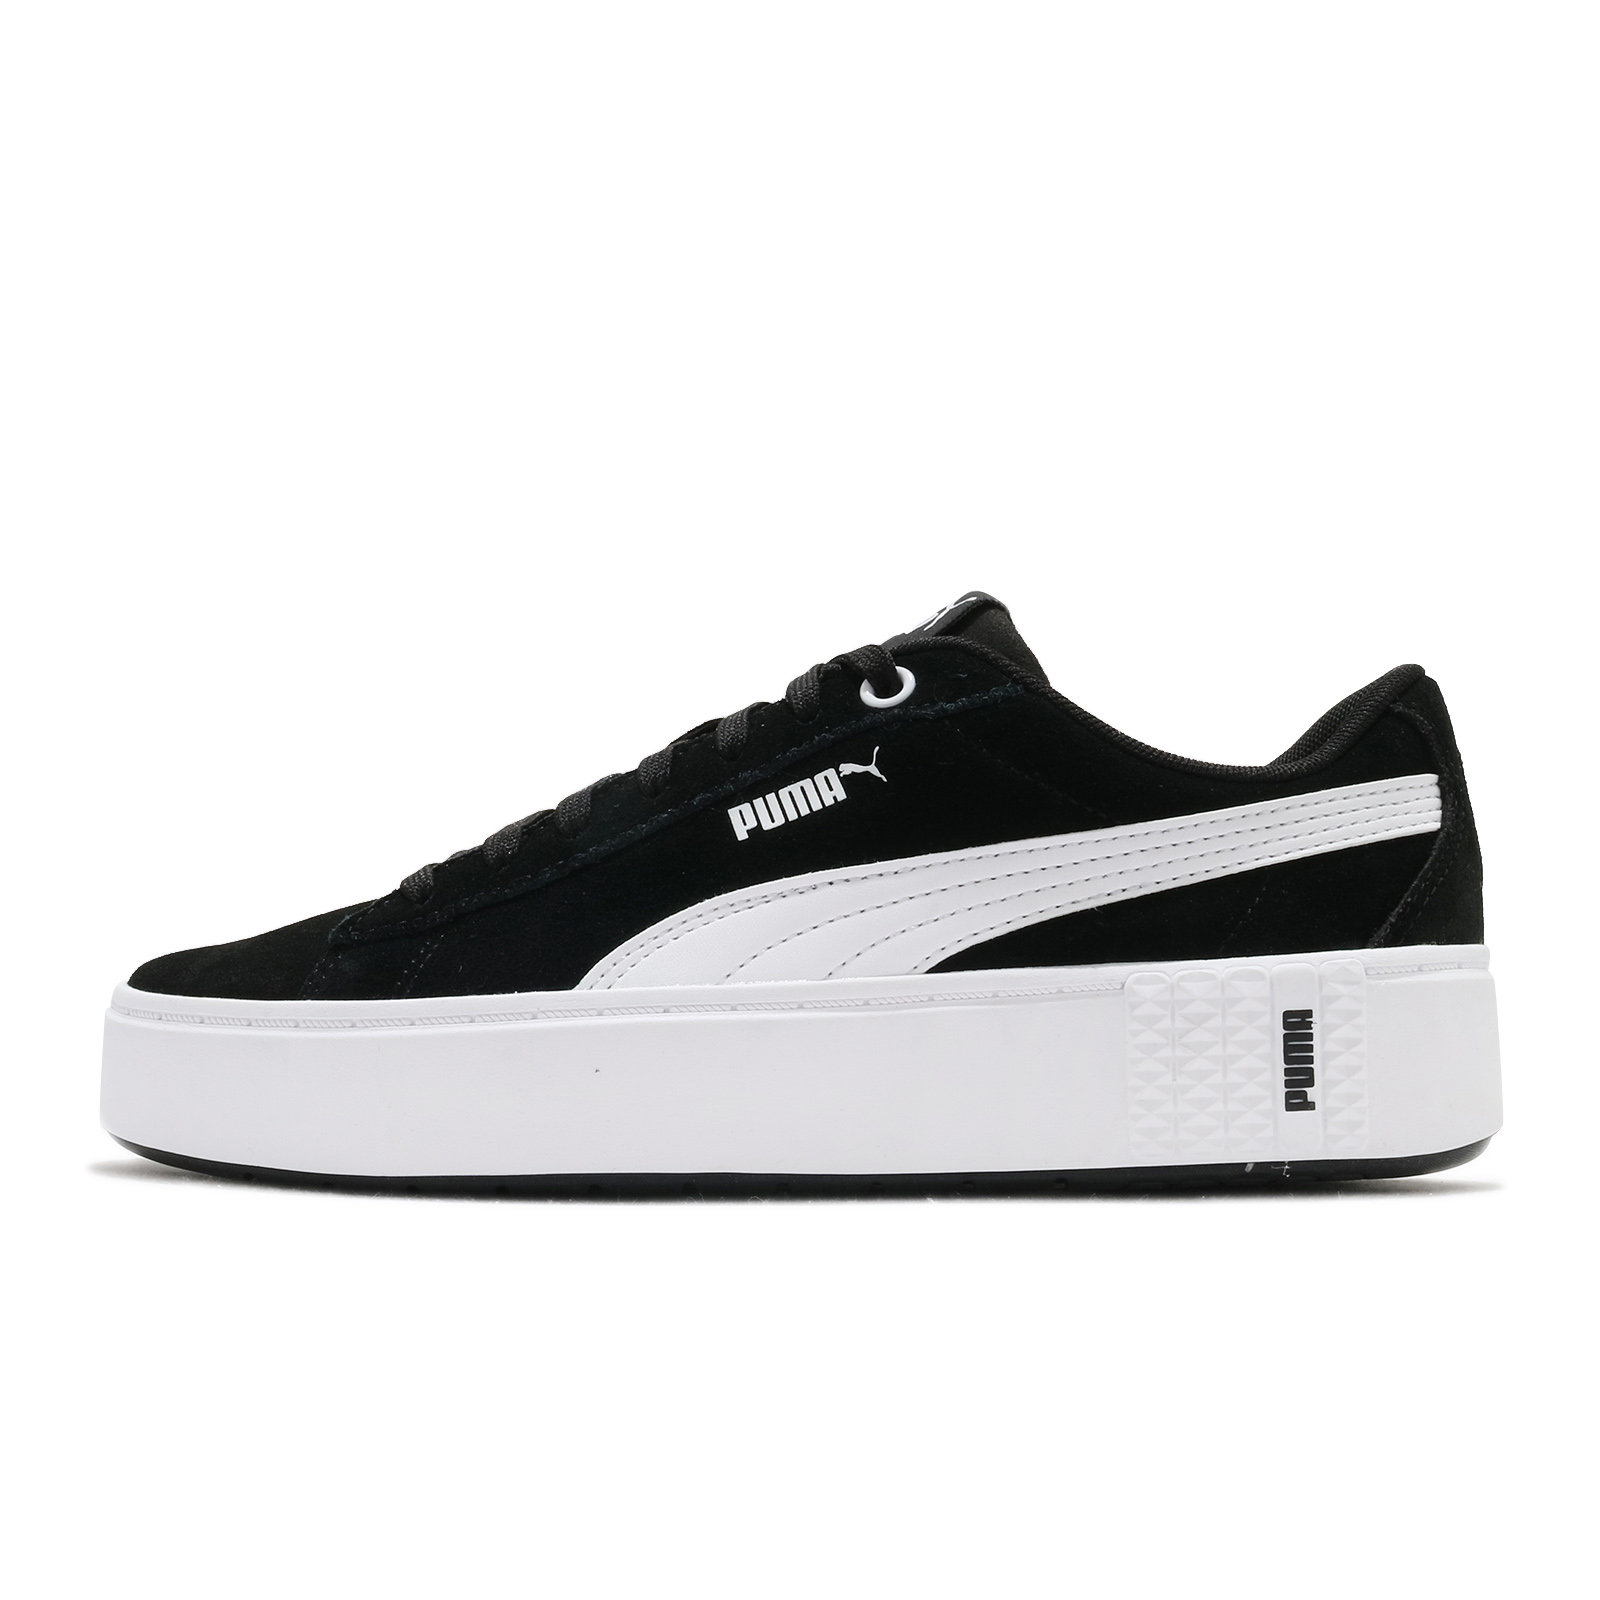 Puma 休閒鞋 Smash Platform V2 SD 黑白 厚底 增高 女鞋 【ACS】 373037-04